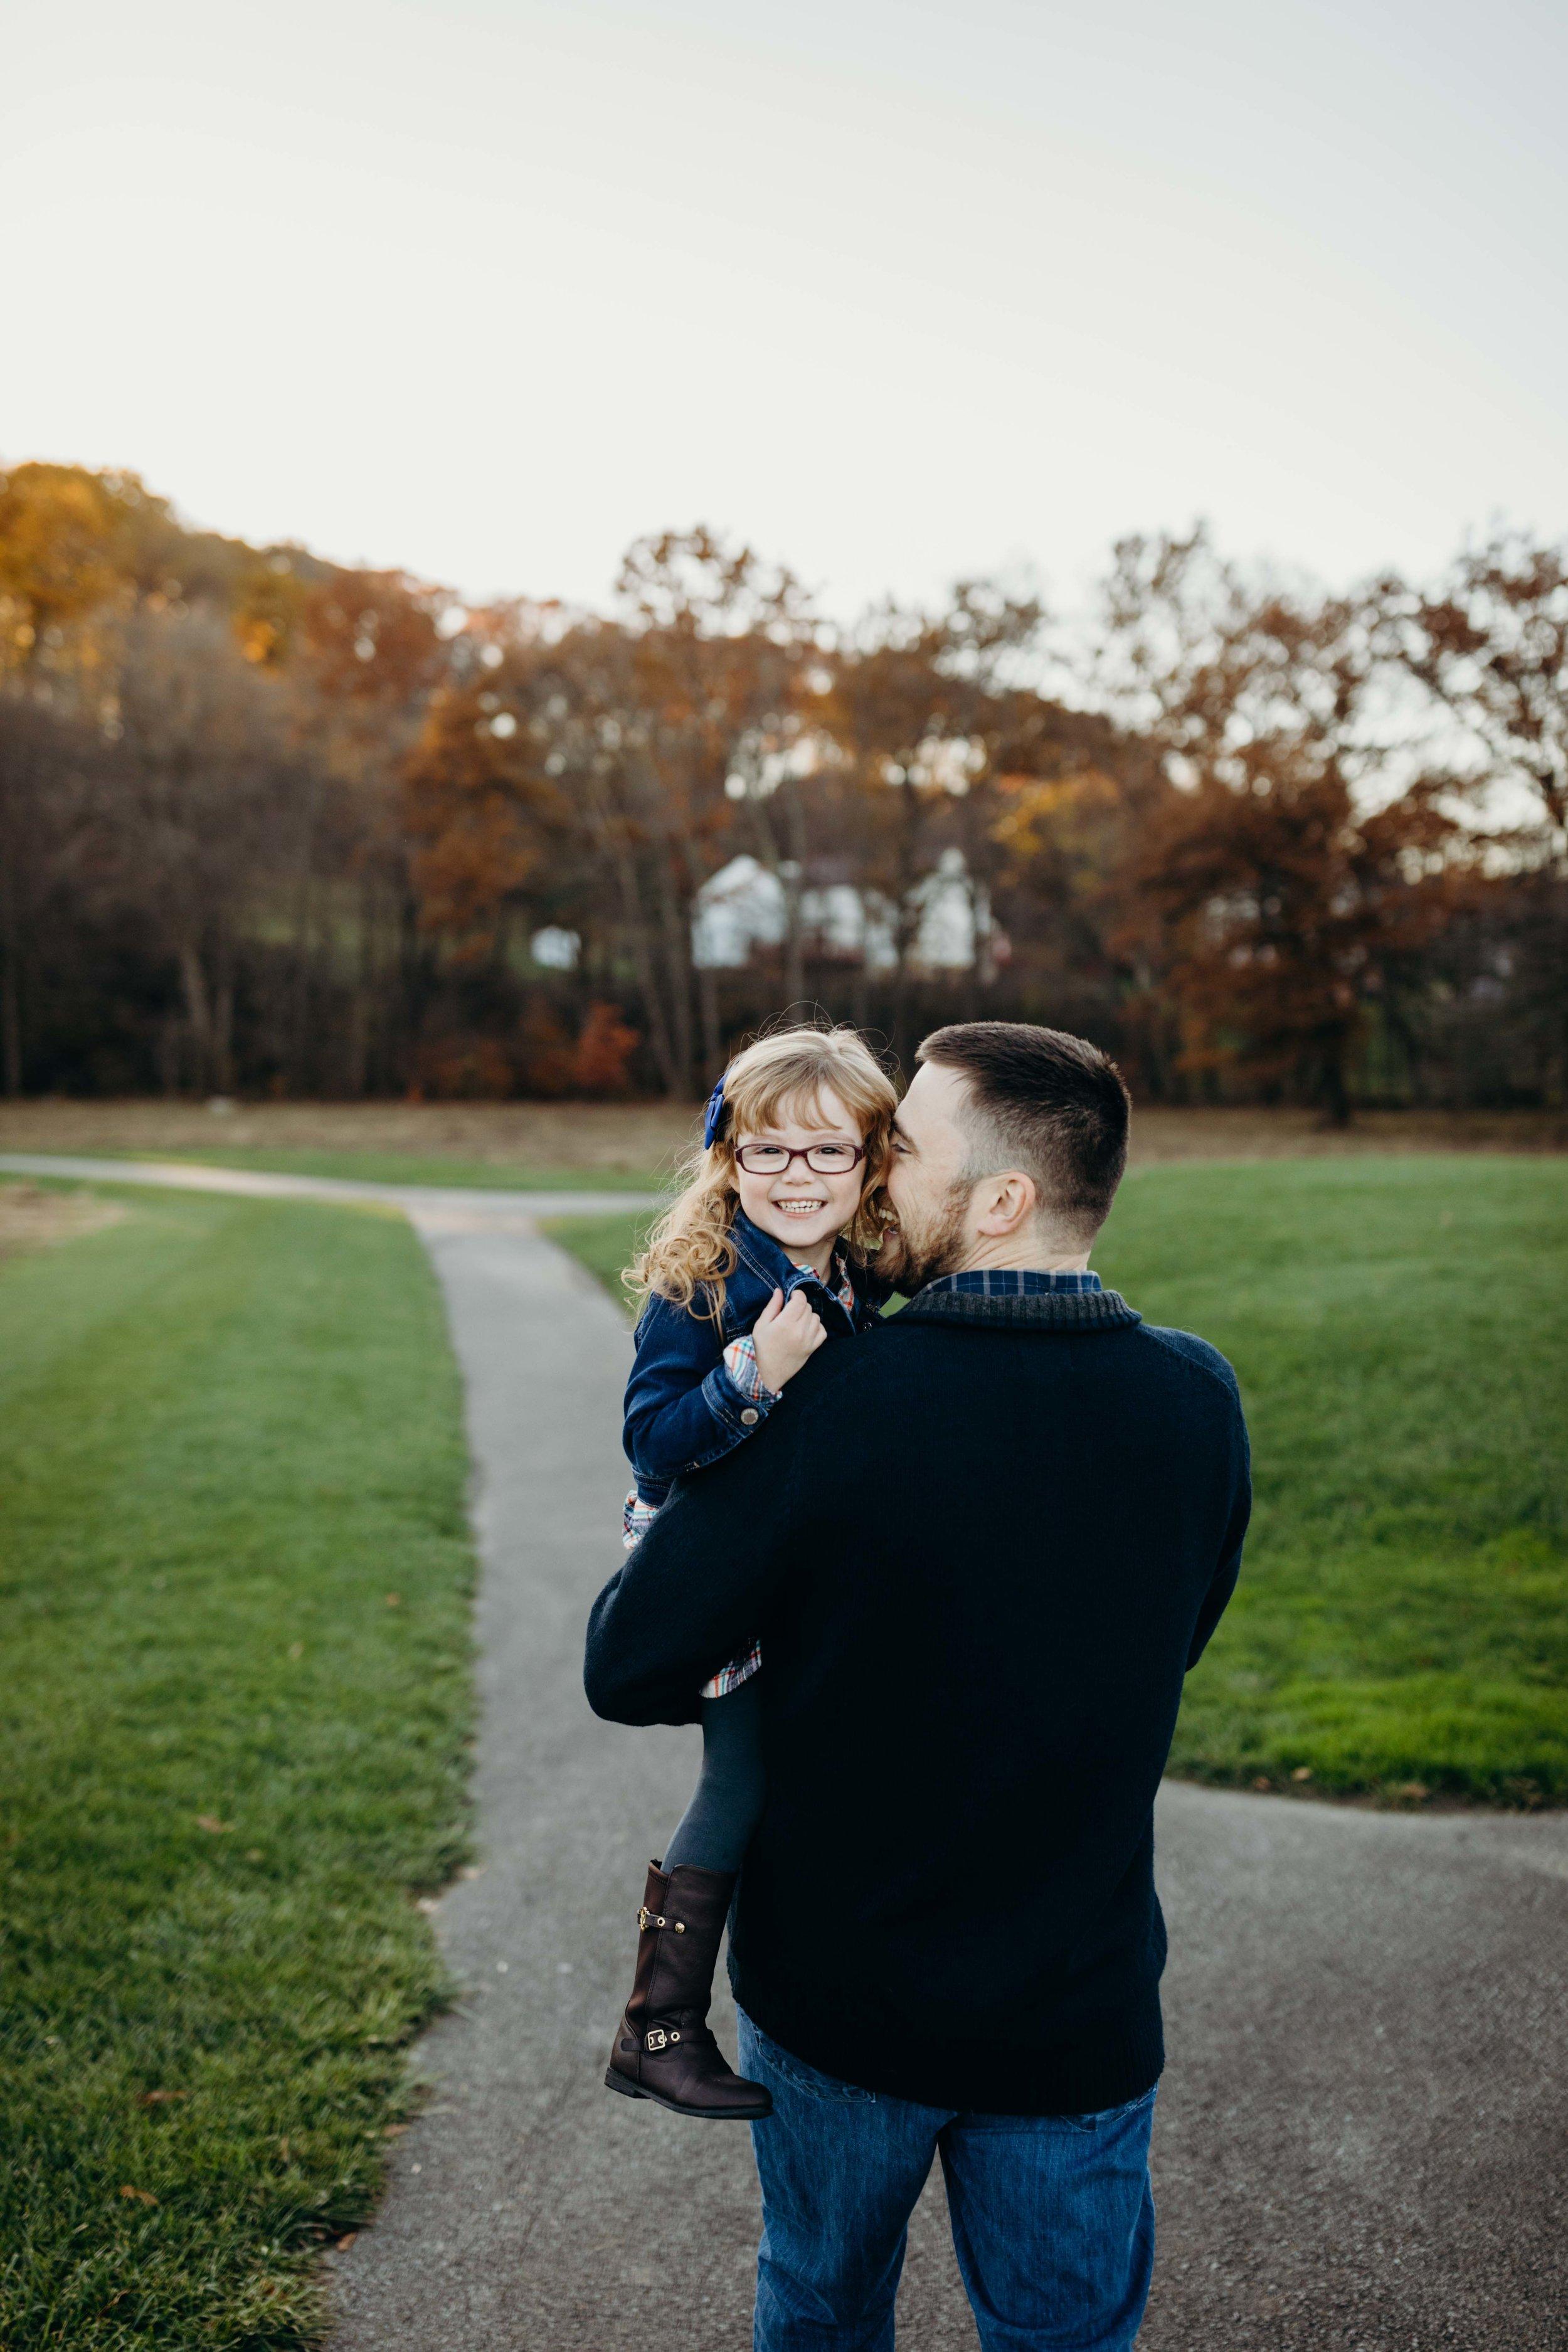 Family Portraits - Abruzzese Family - North Park-5.jpg